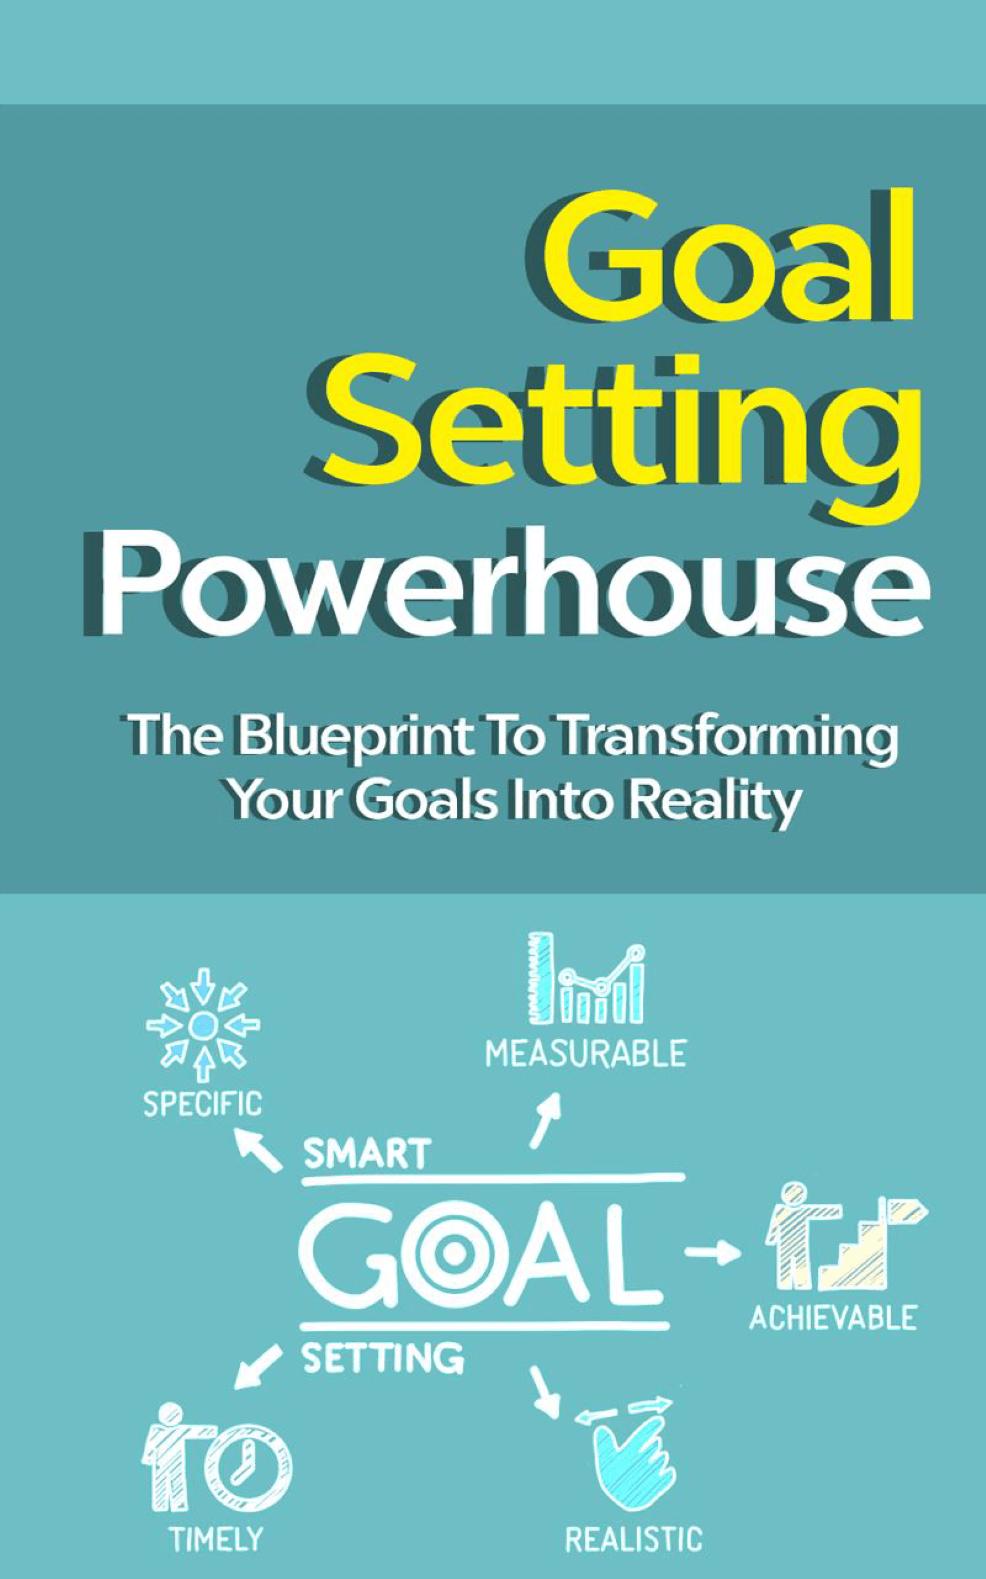 Goal Setting Powerhouse Gold